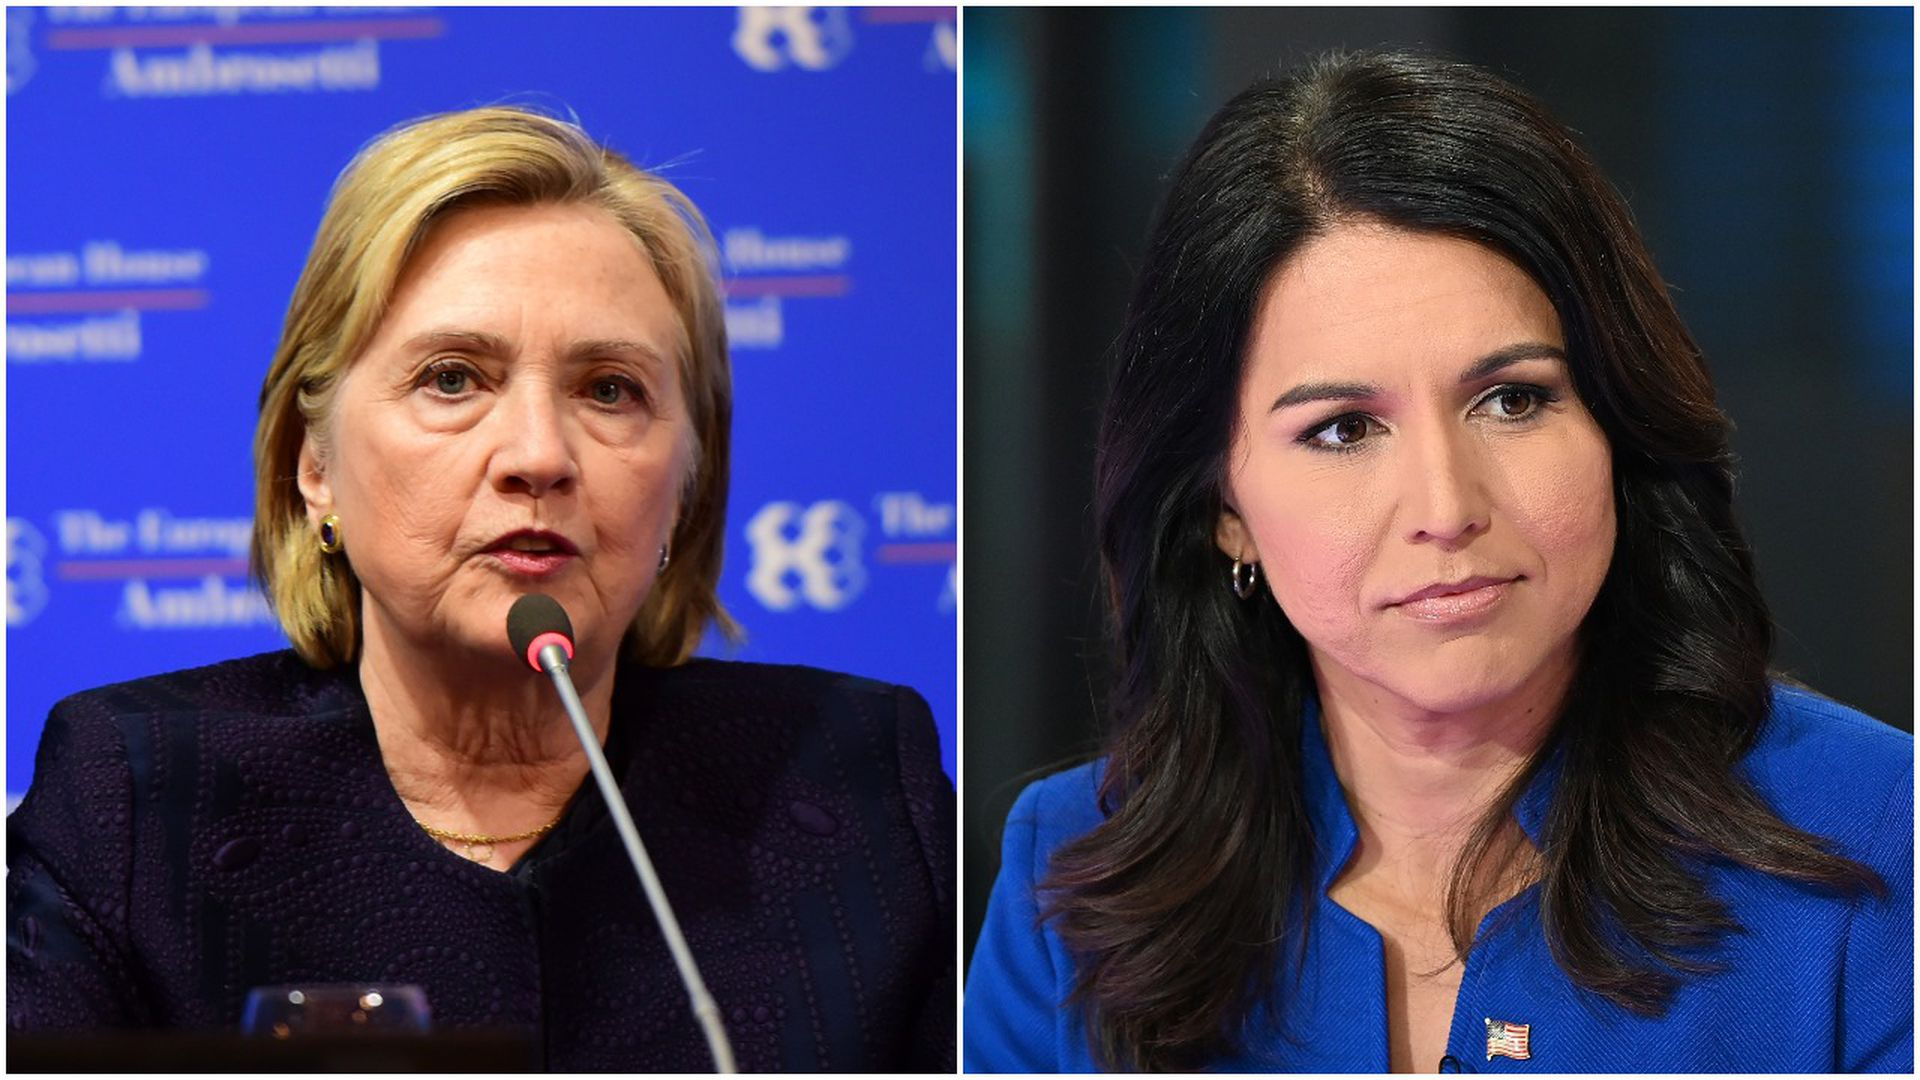 Tulsi Gabbard alleges Hillary Clinton is seeking revenge for 2016 Sanders endorsement